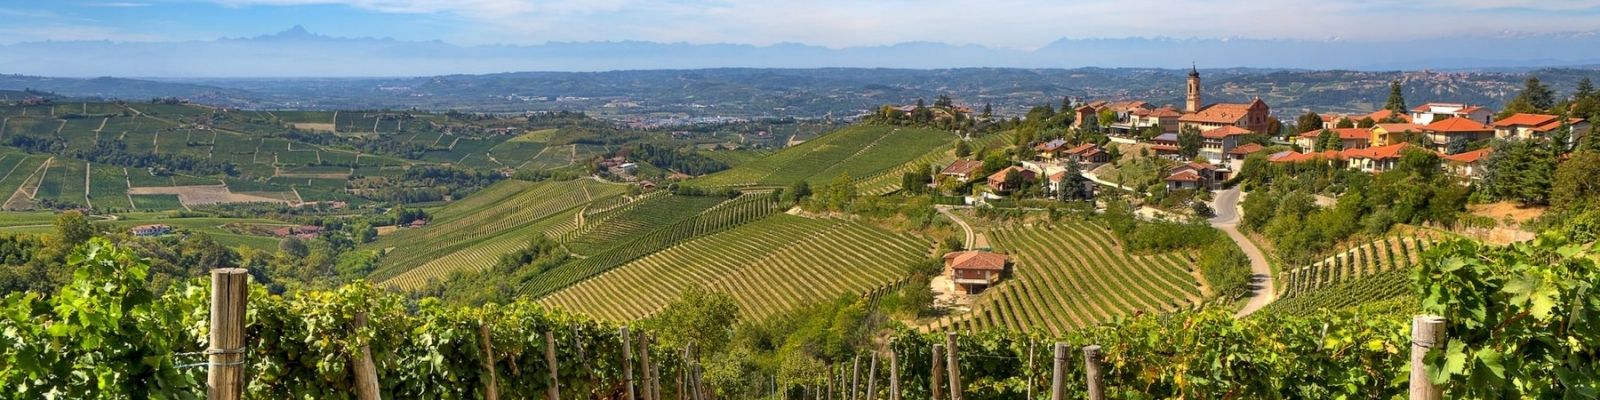 Langhe And Monferrato